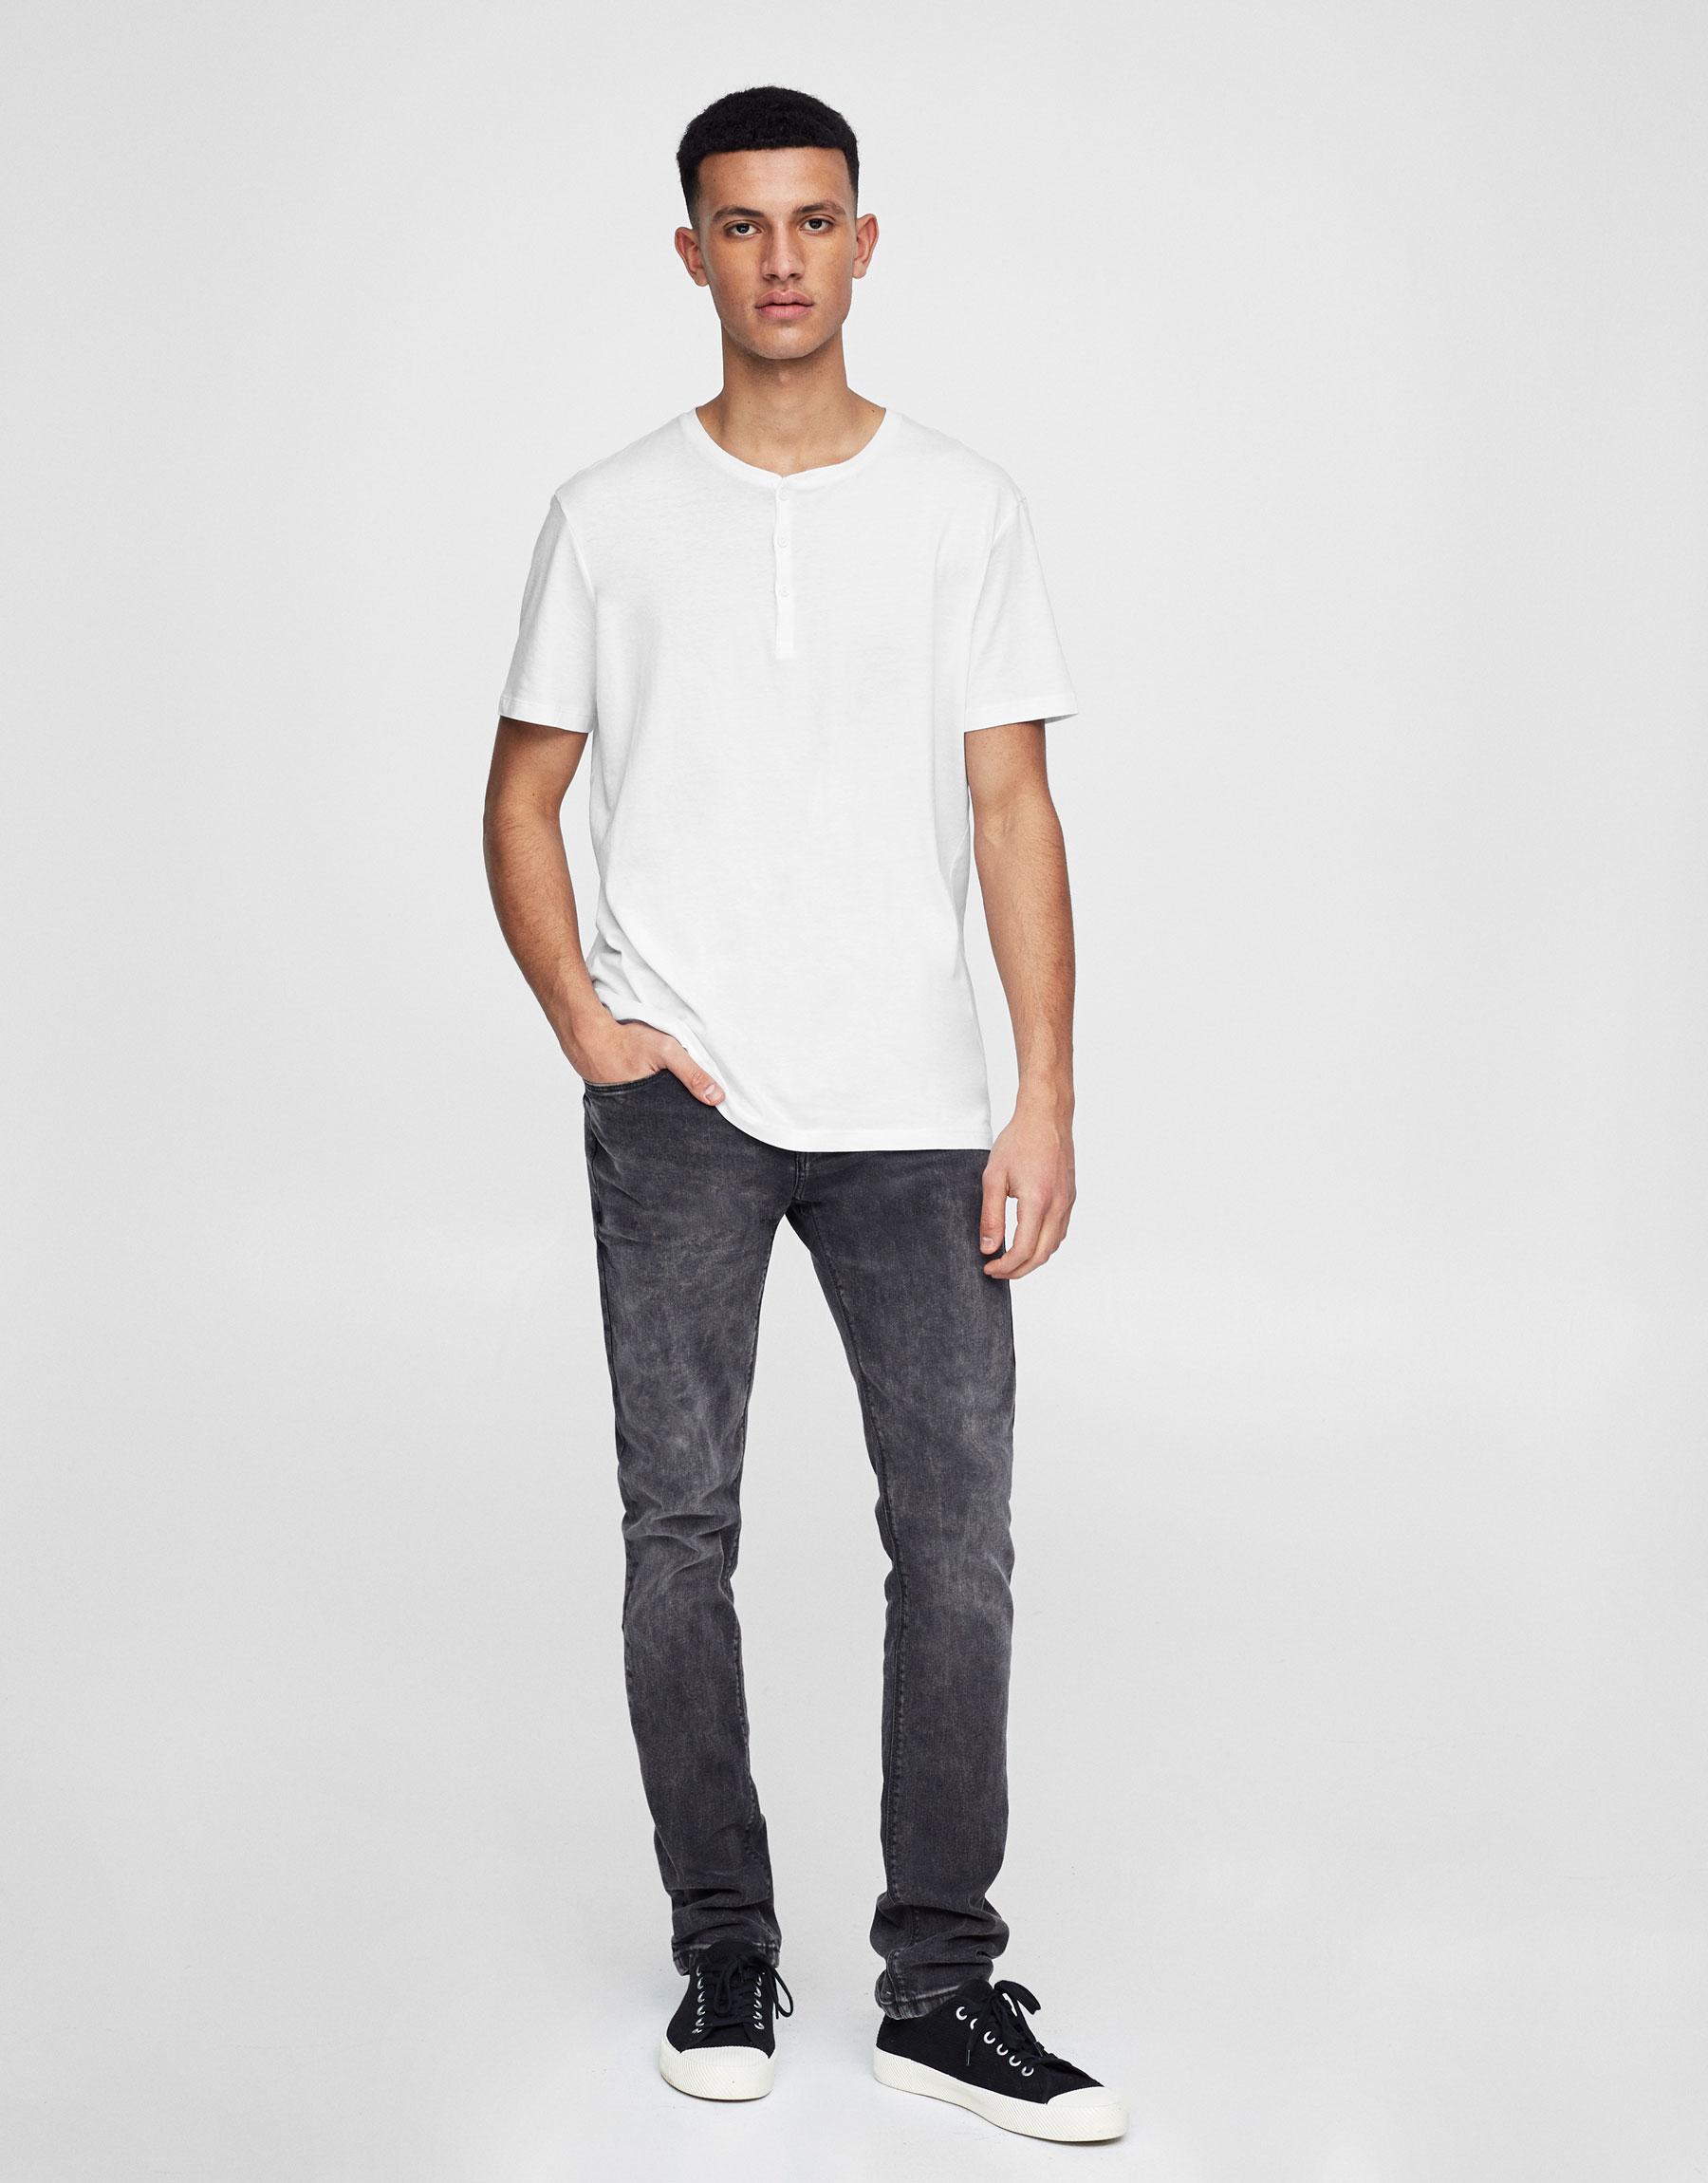 Jeans skinny fit black (Colección Marc Márquez)